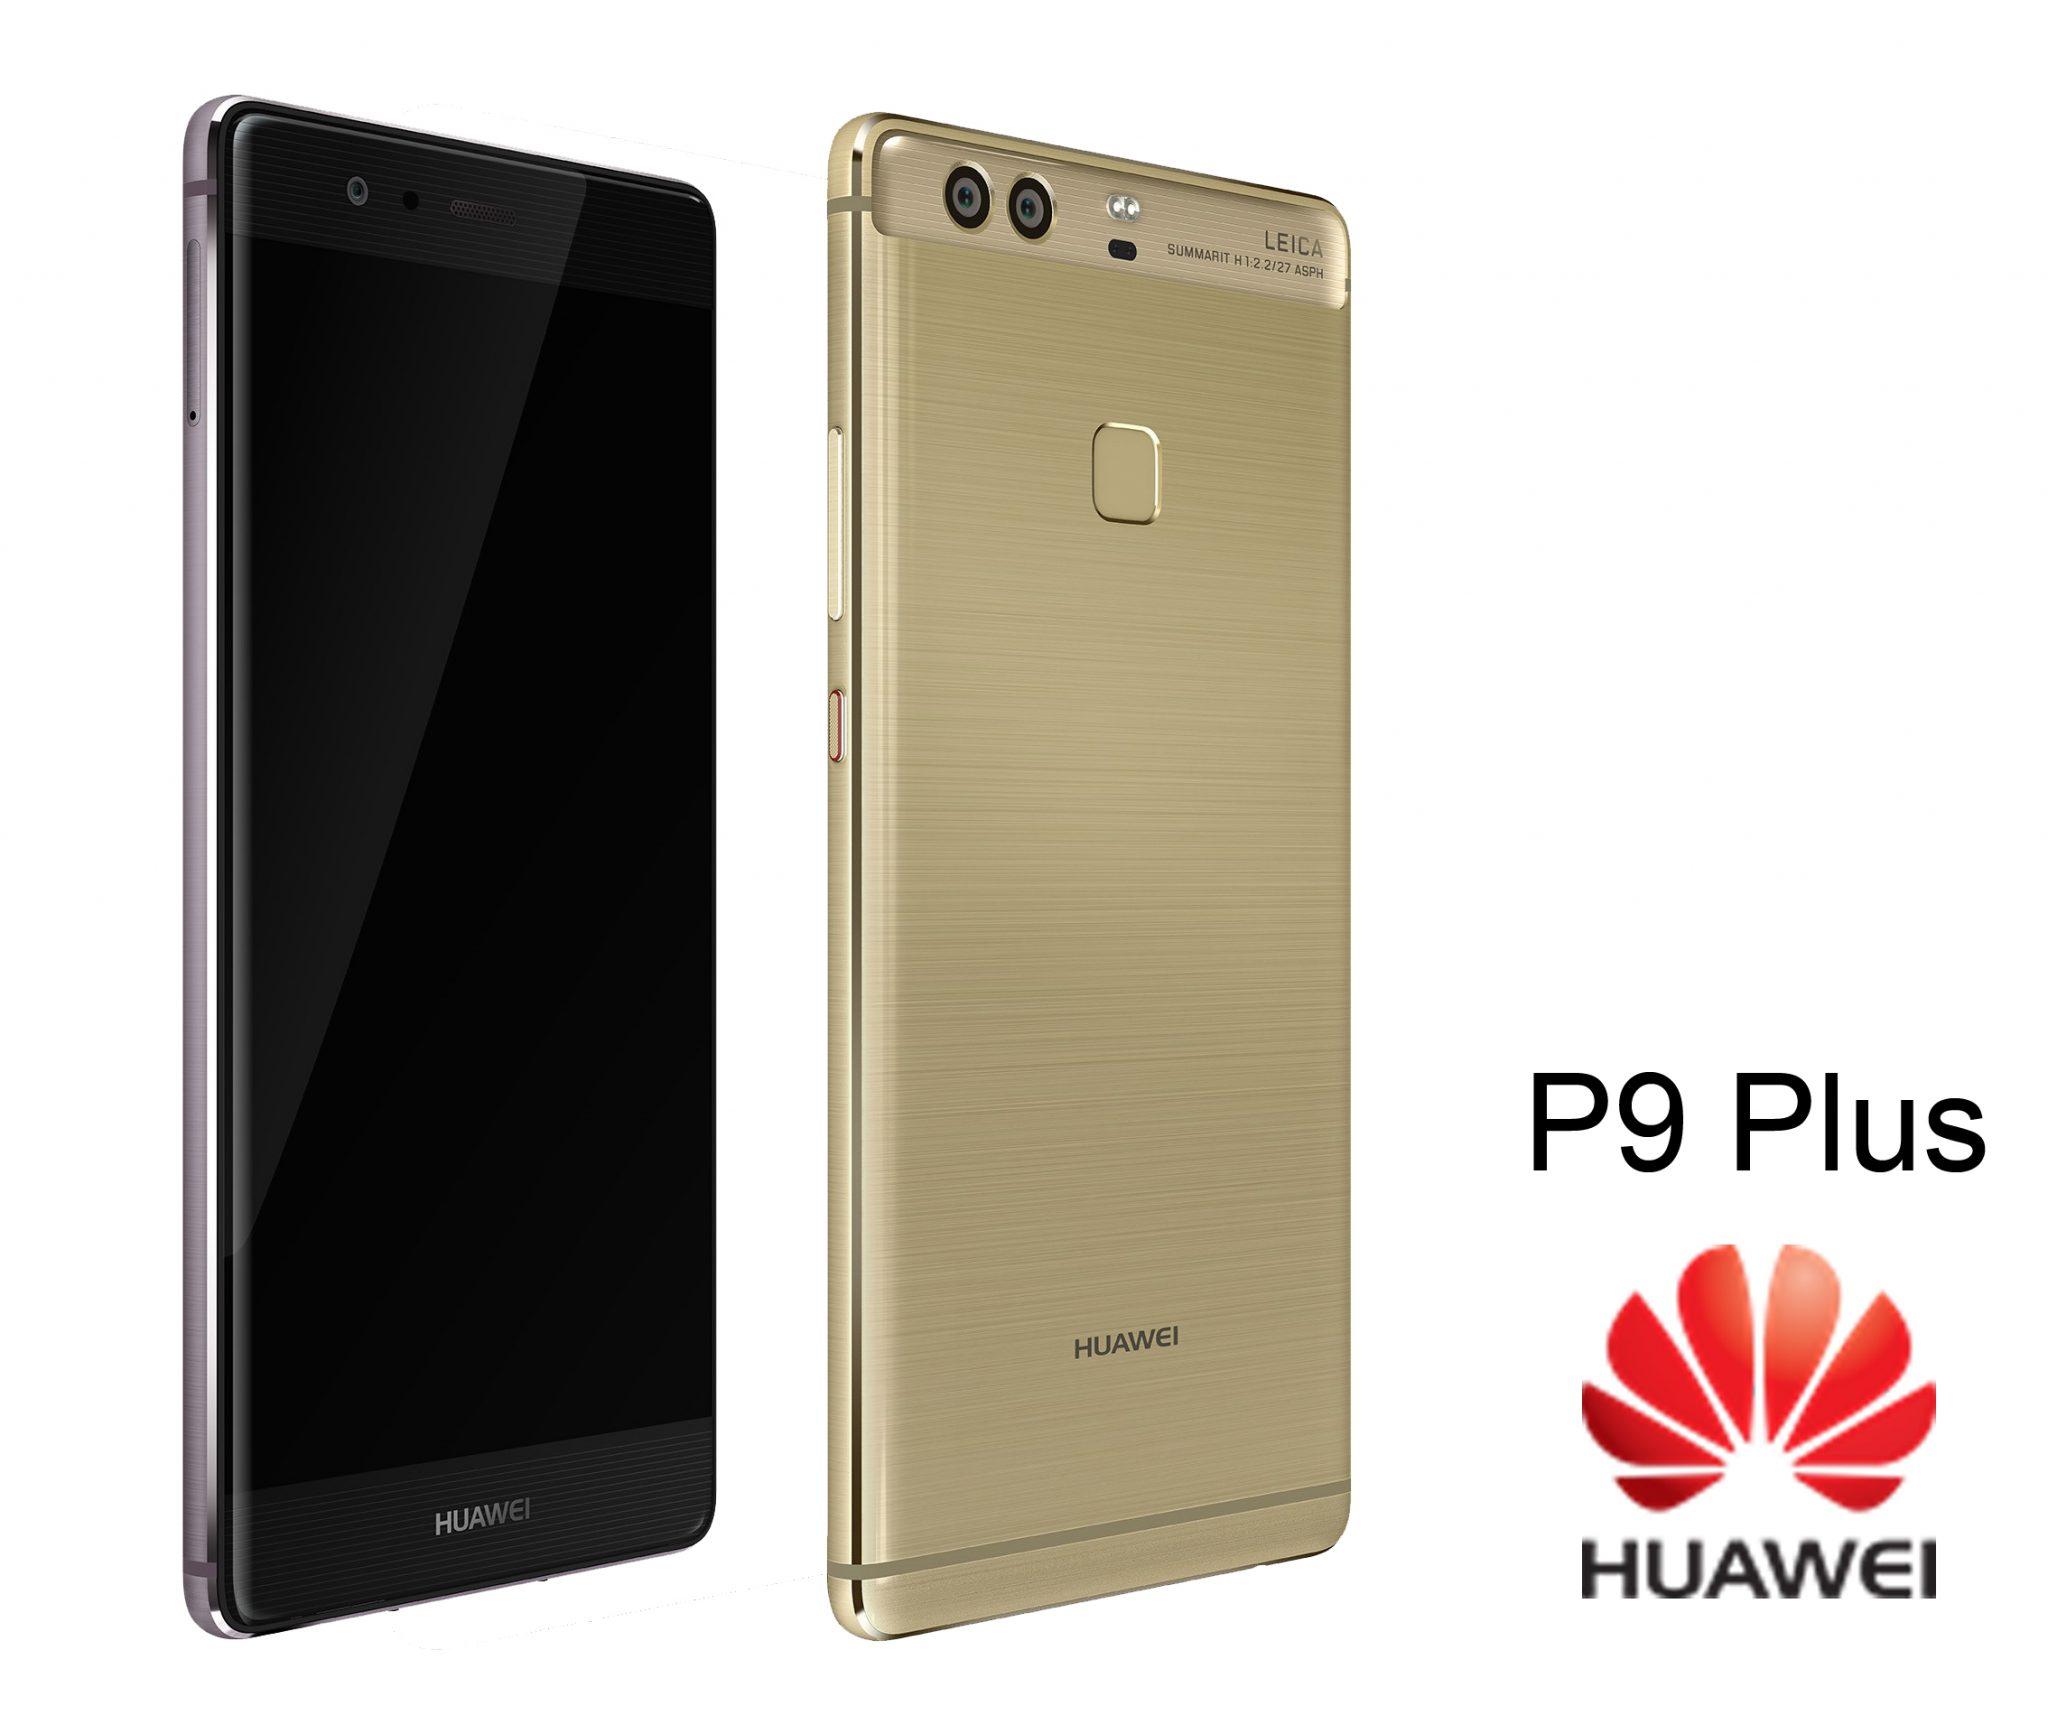 huawei phones price list p9. huawei phones price list p9